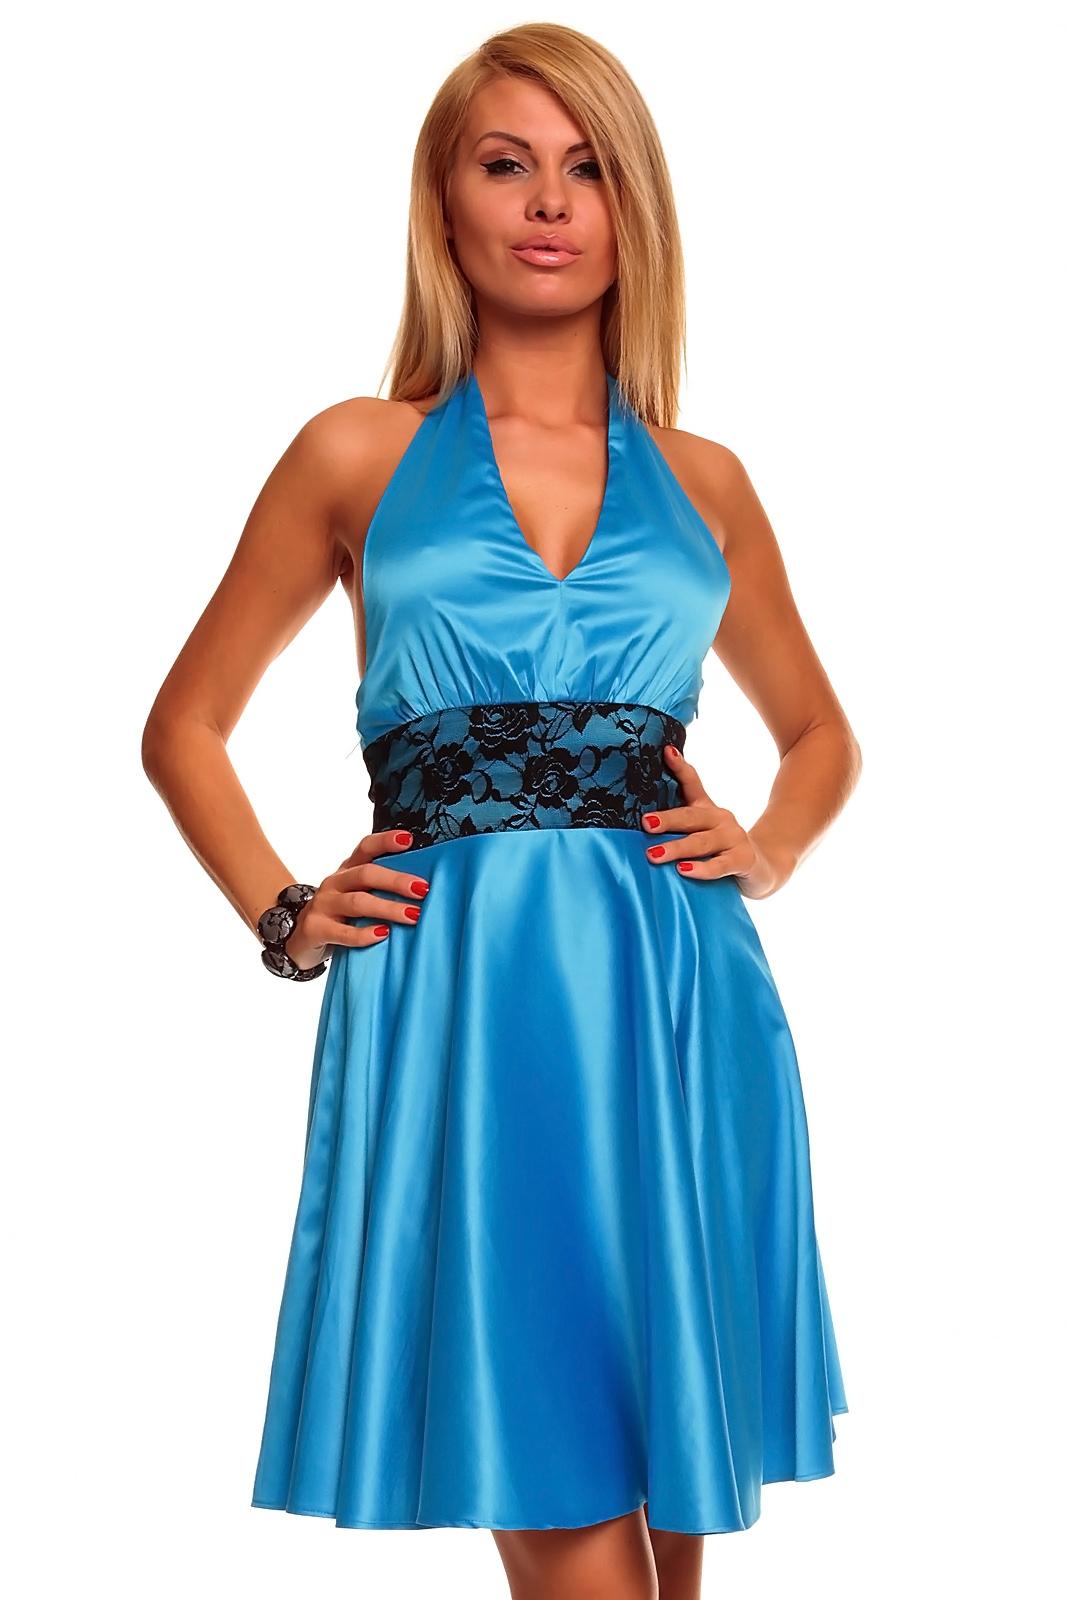 ec5797c9d0a4 Spoločenské šaty modré